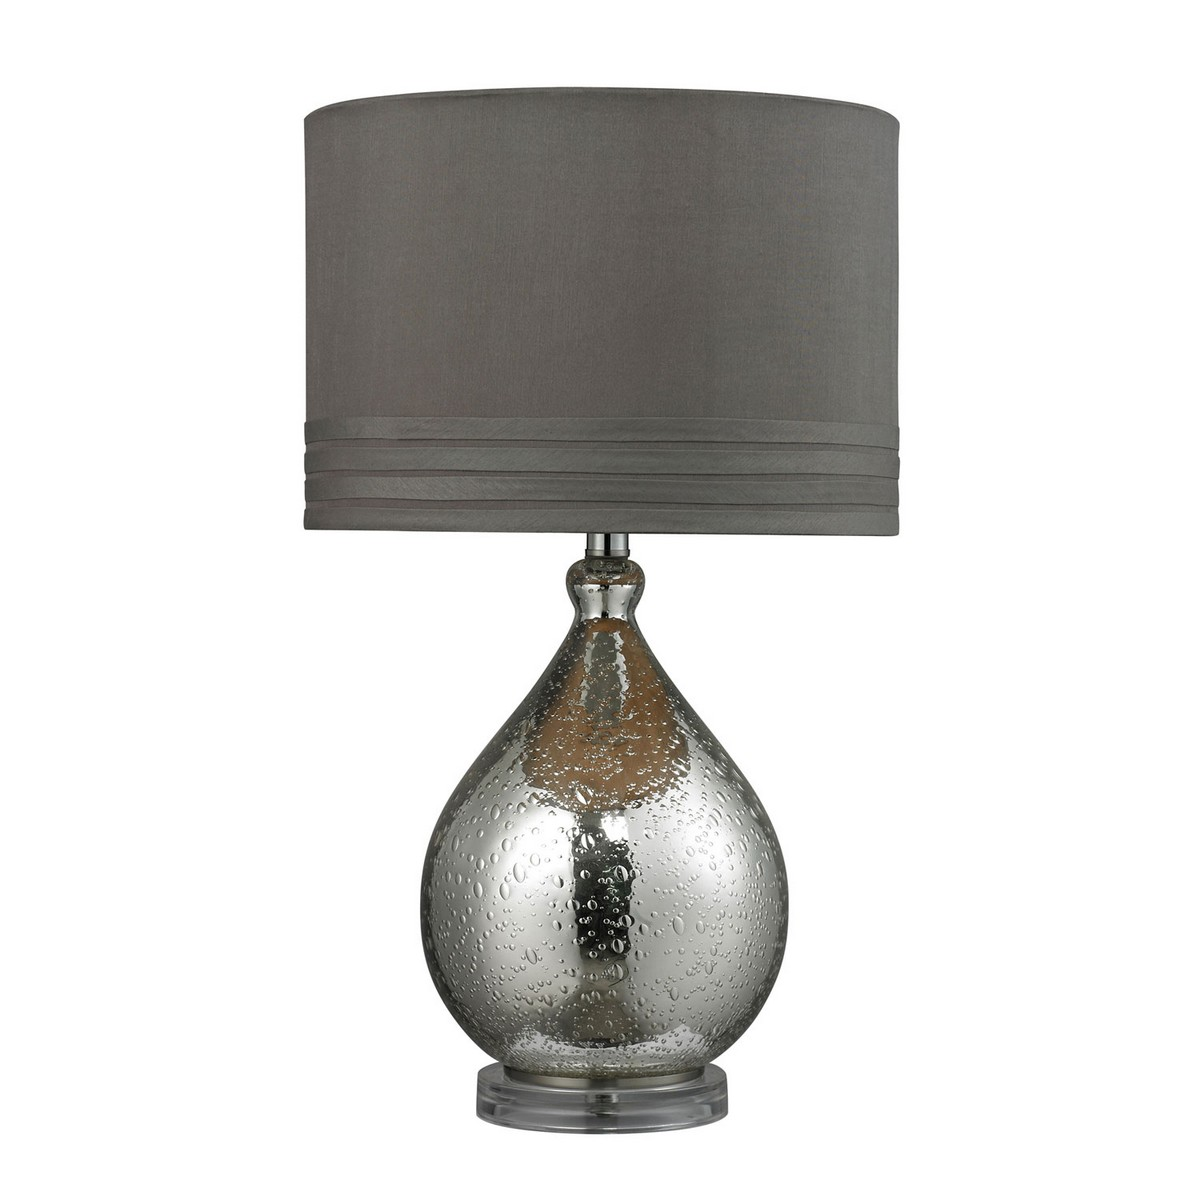 Elk Lighting D252 Table Lamp - Mercury Glass